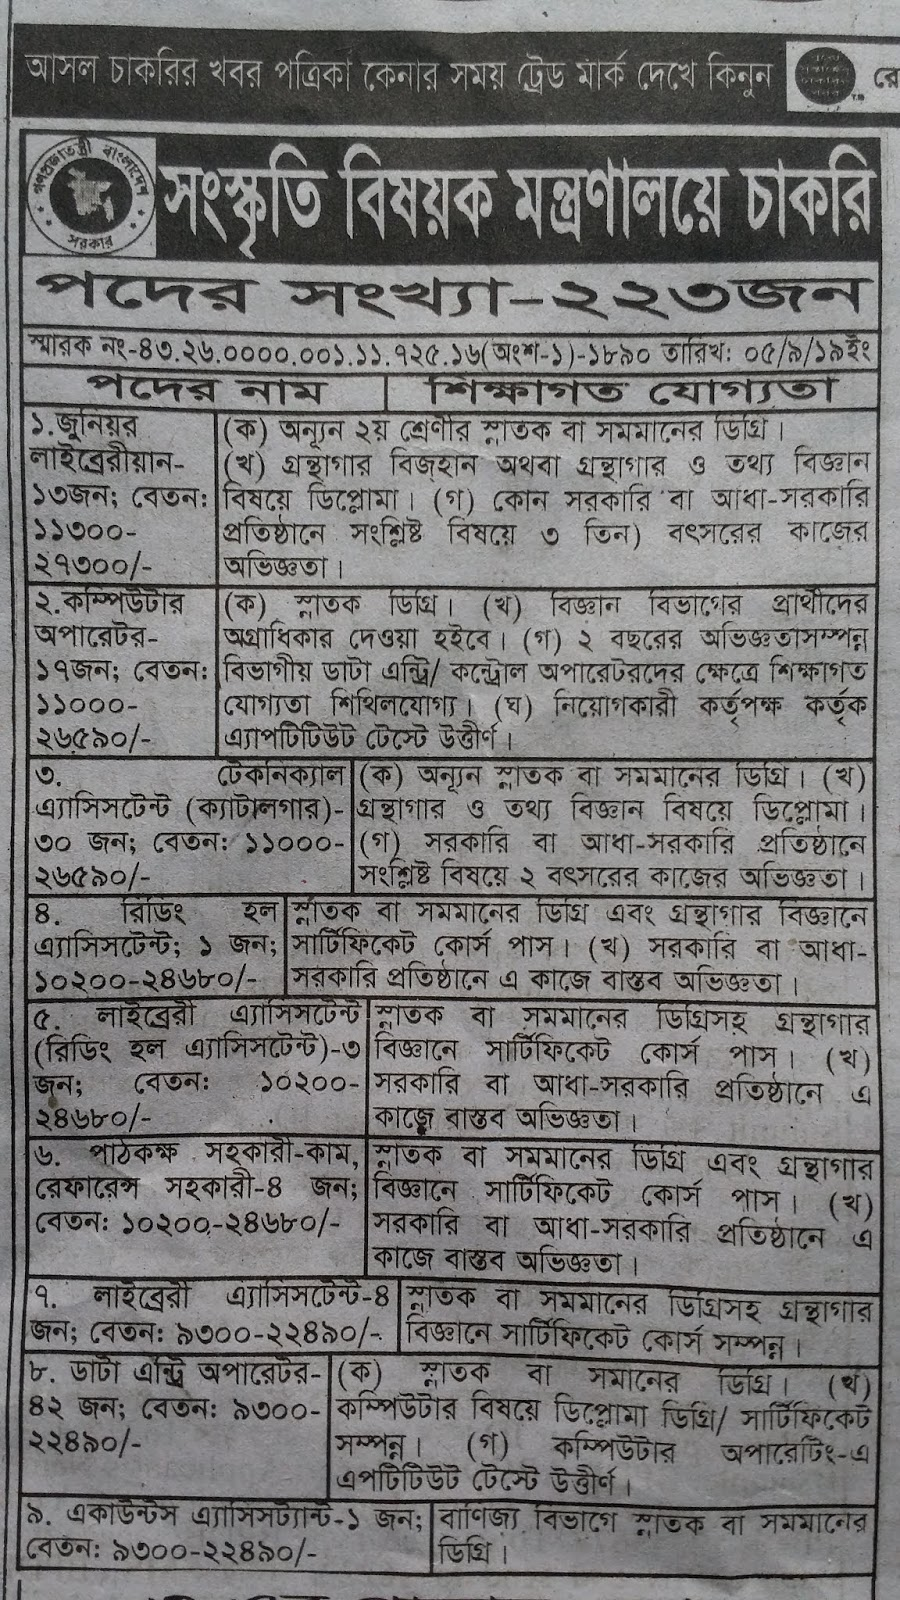 Ministry-of-Cultural-Affairs-job-Circular.